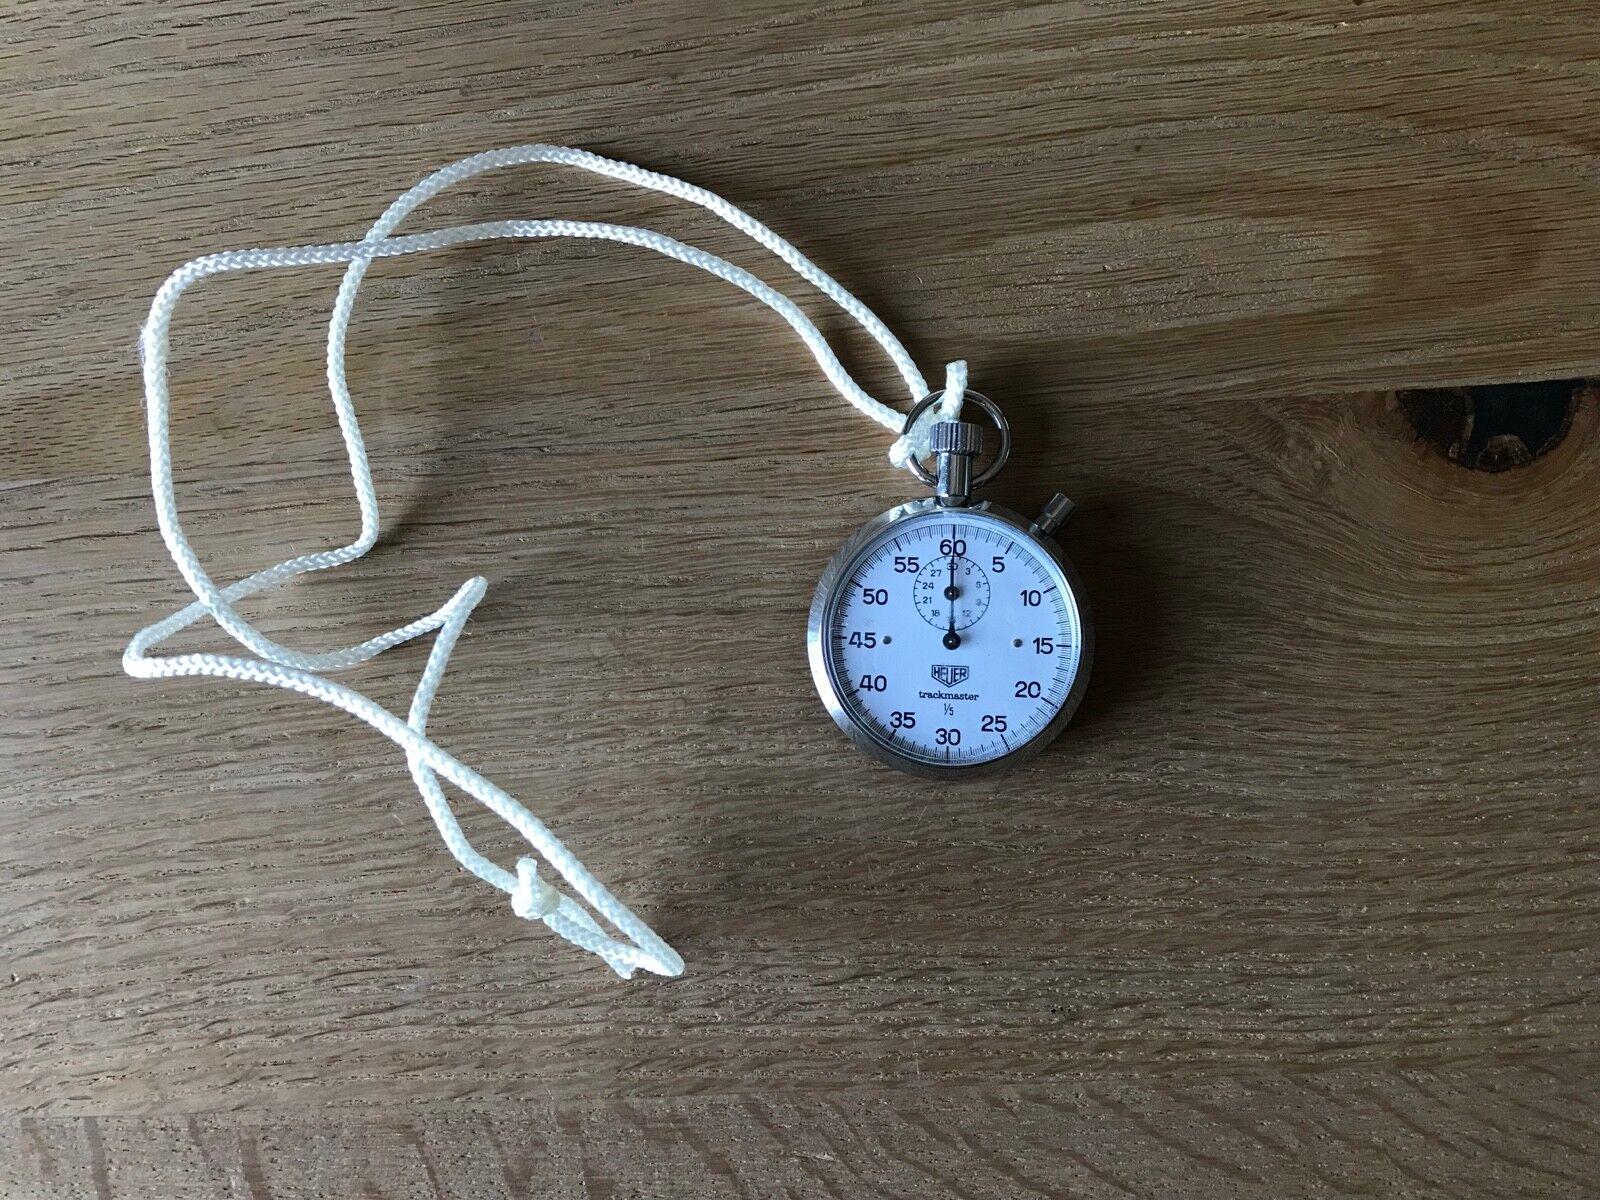 Reloj Cronógrafo HEUER TRACKMASTER Stopwatch - Swiss Watch - Steel - Vintage